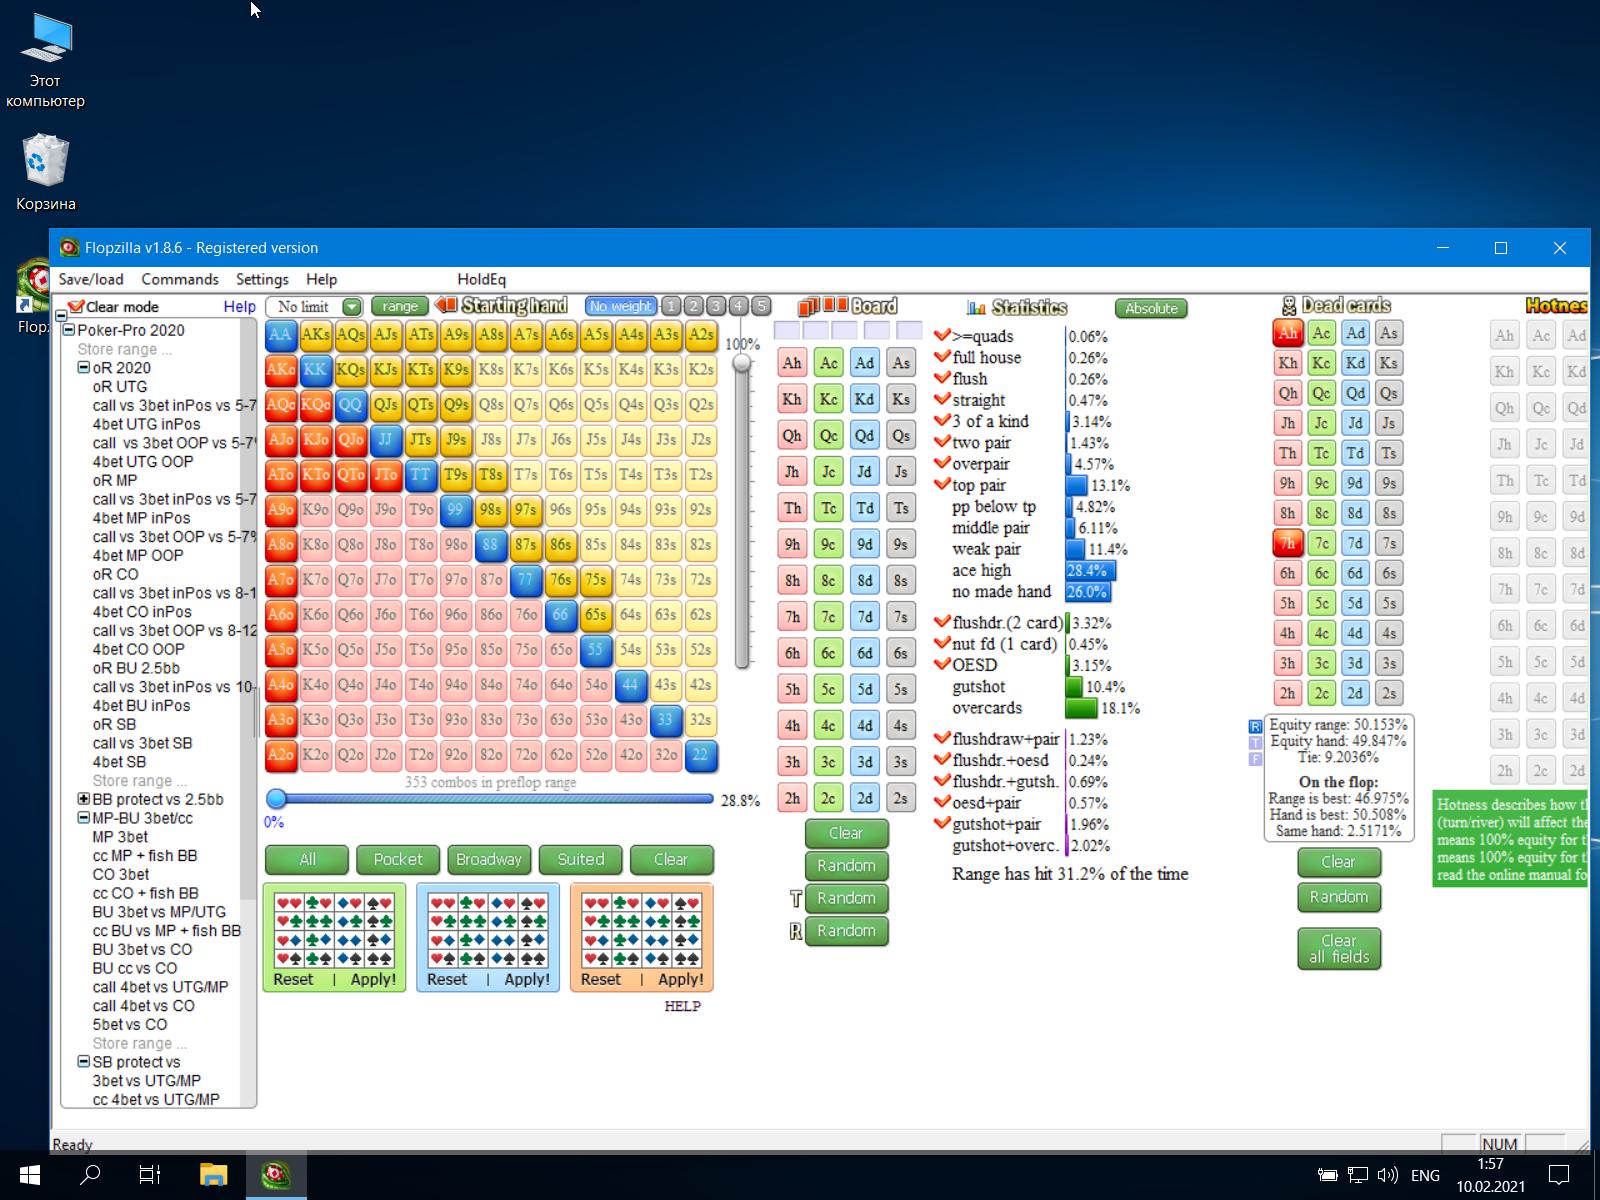 virtualboxwin-10100220210157541612911486.png